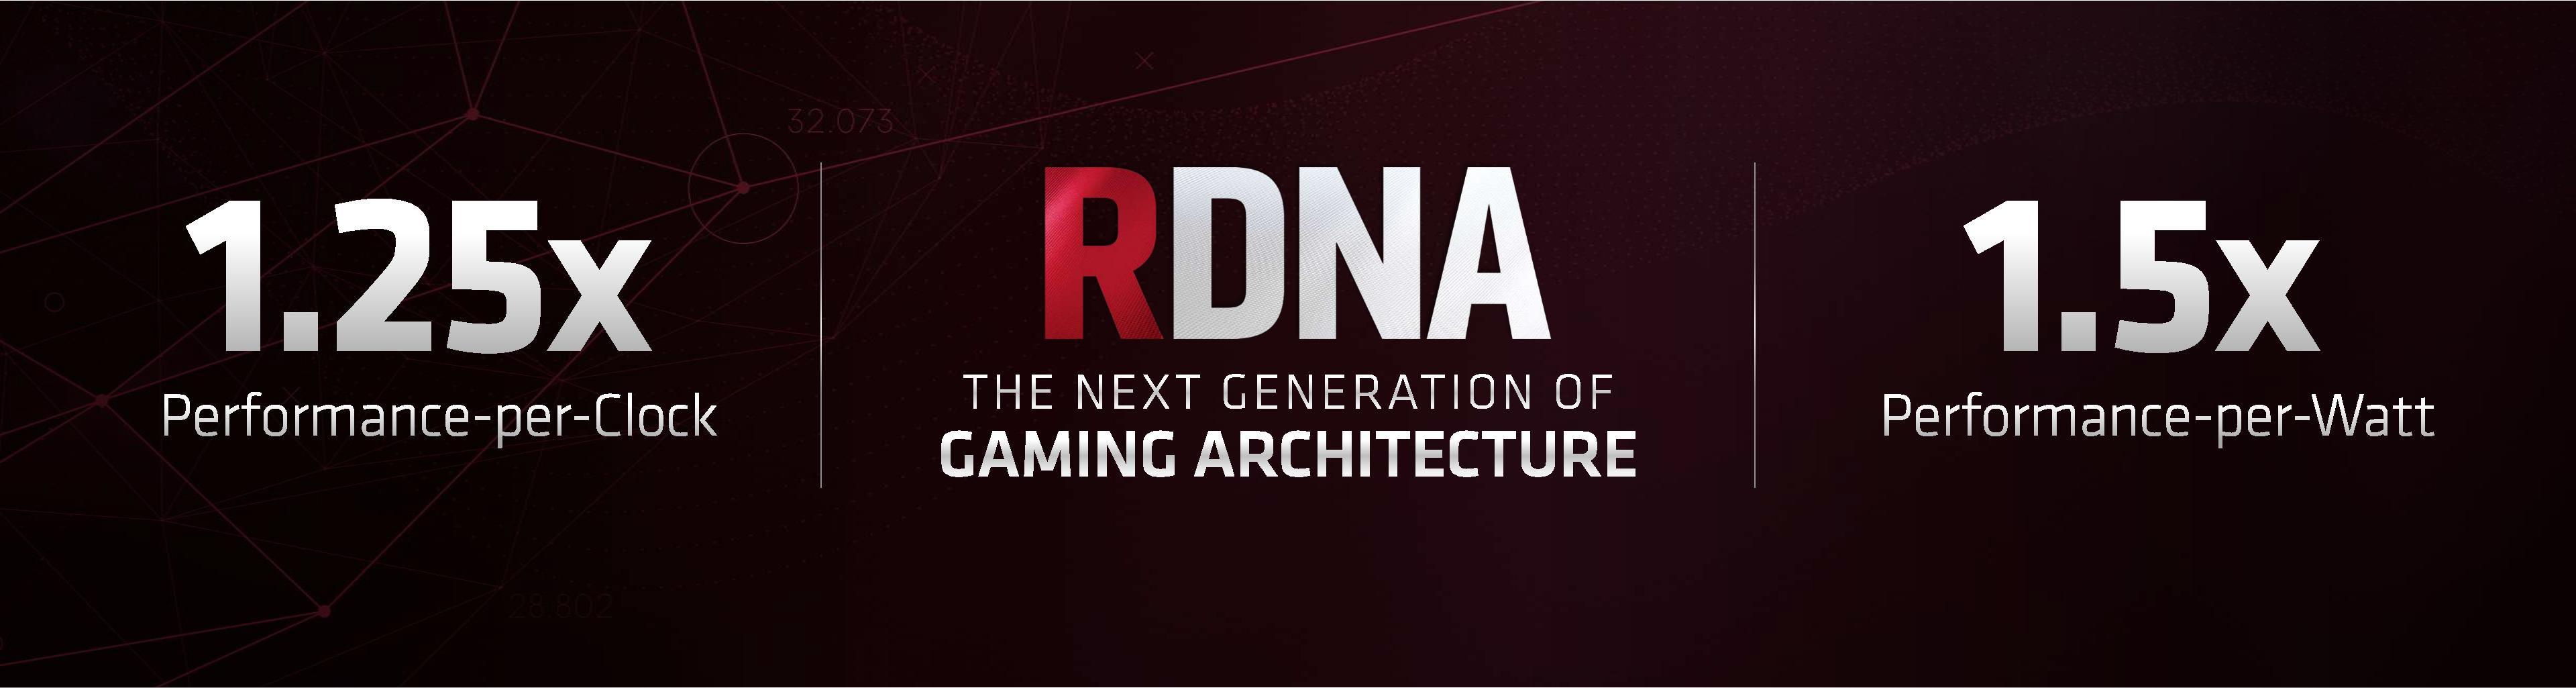 AMD RDNA Microarchitecture